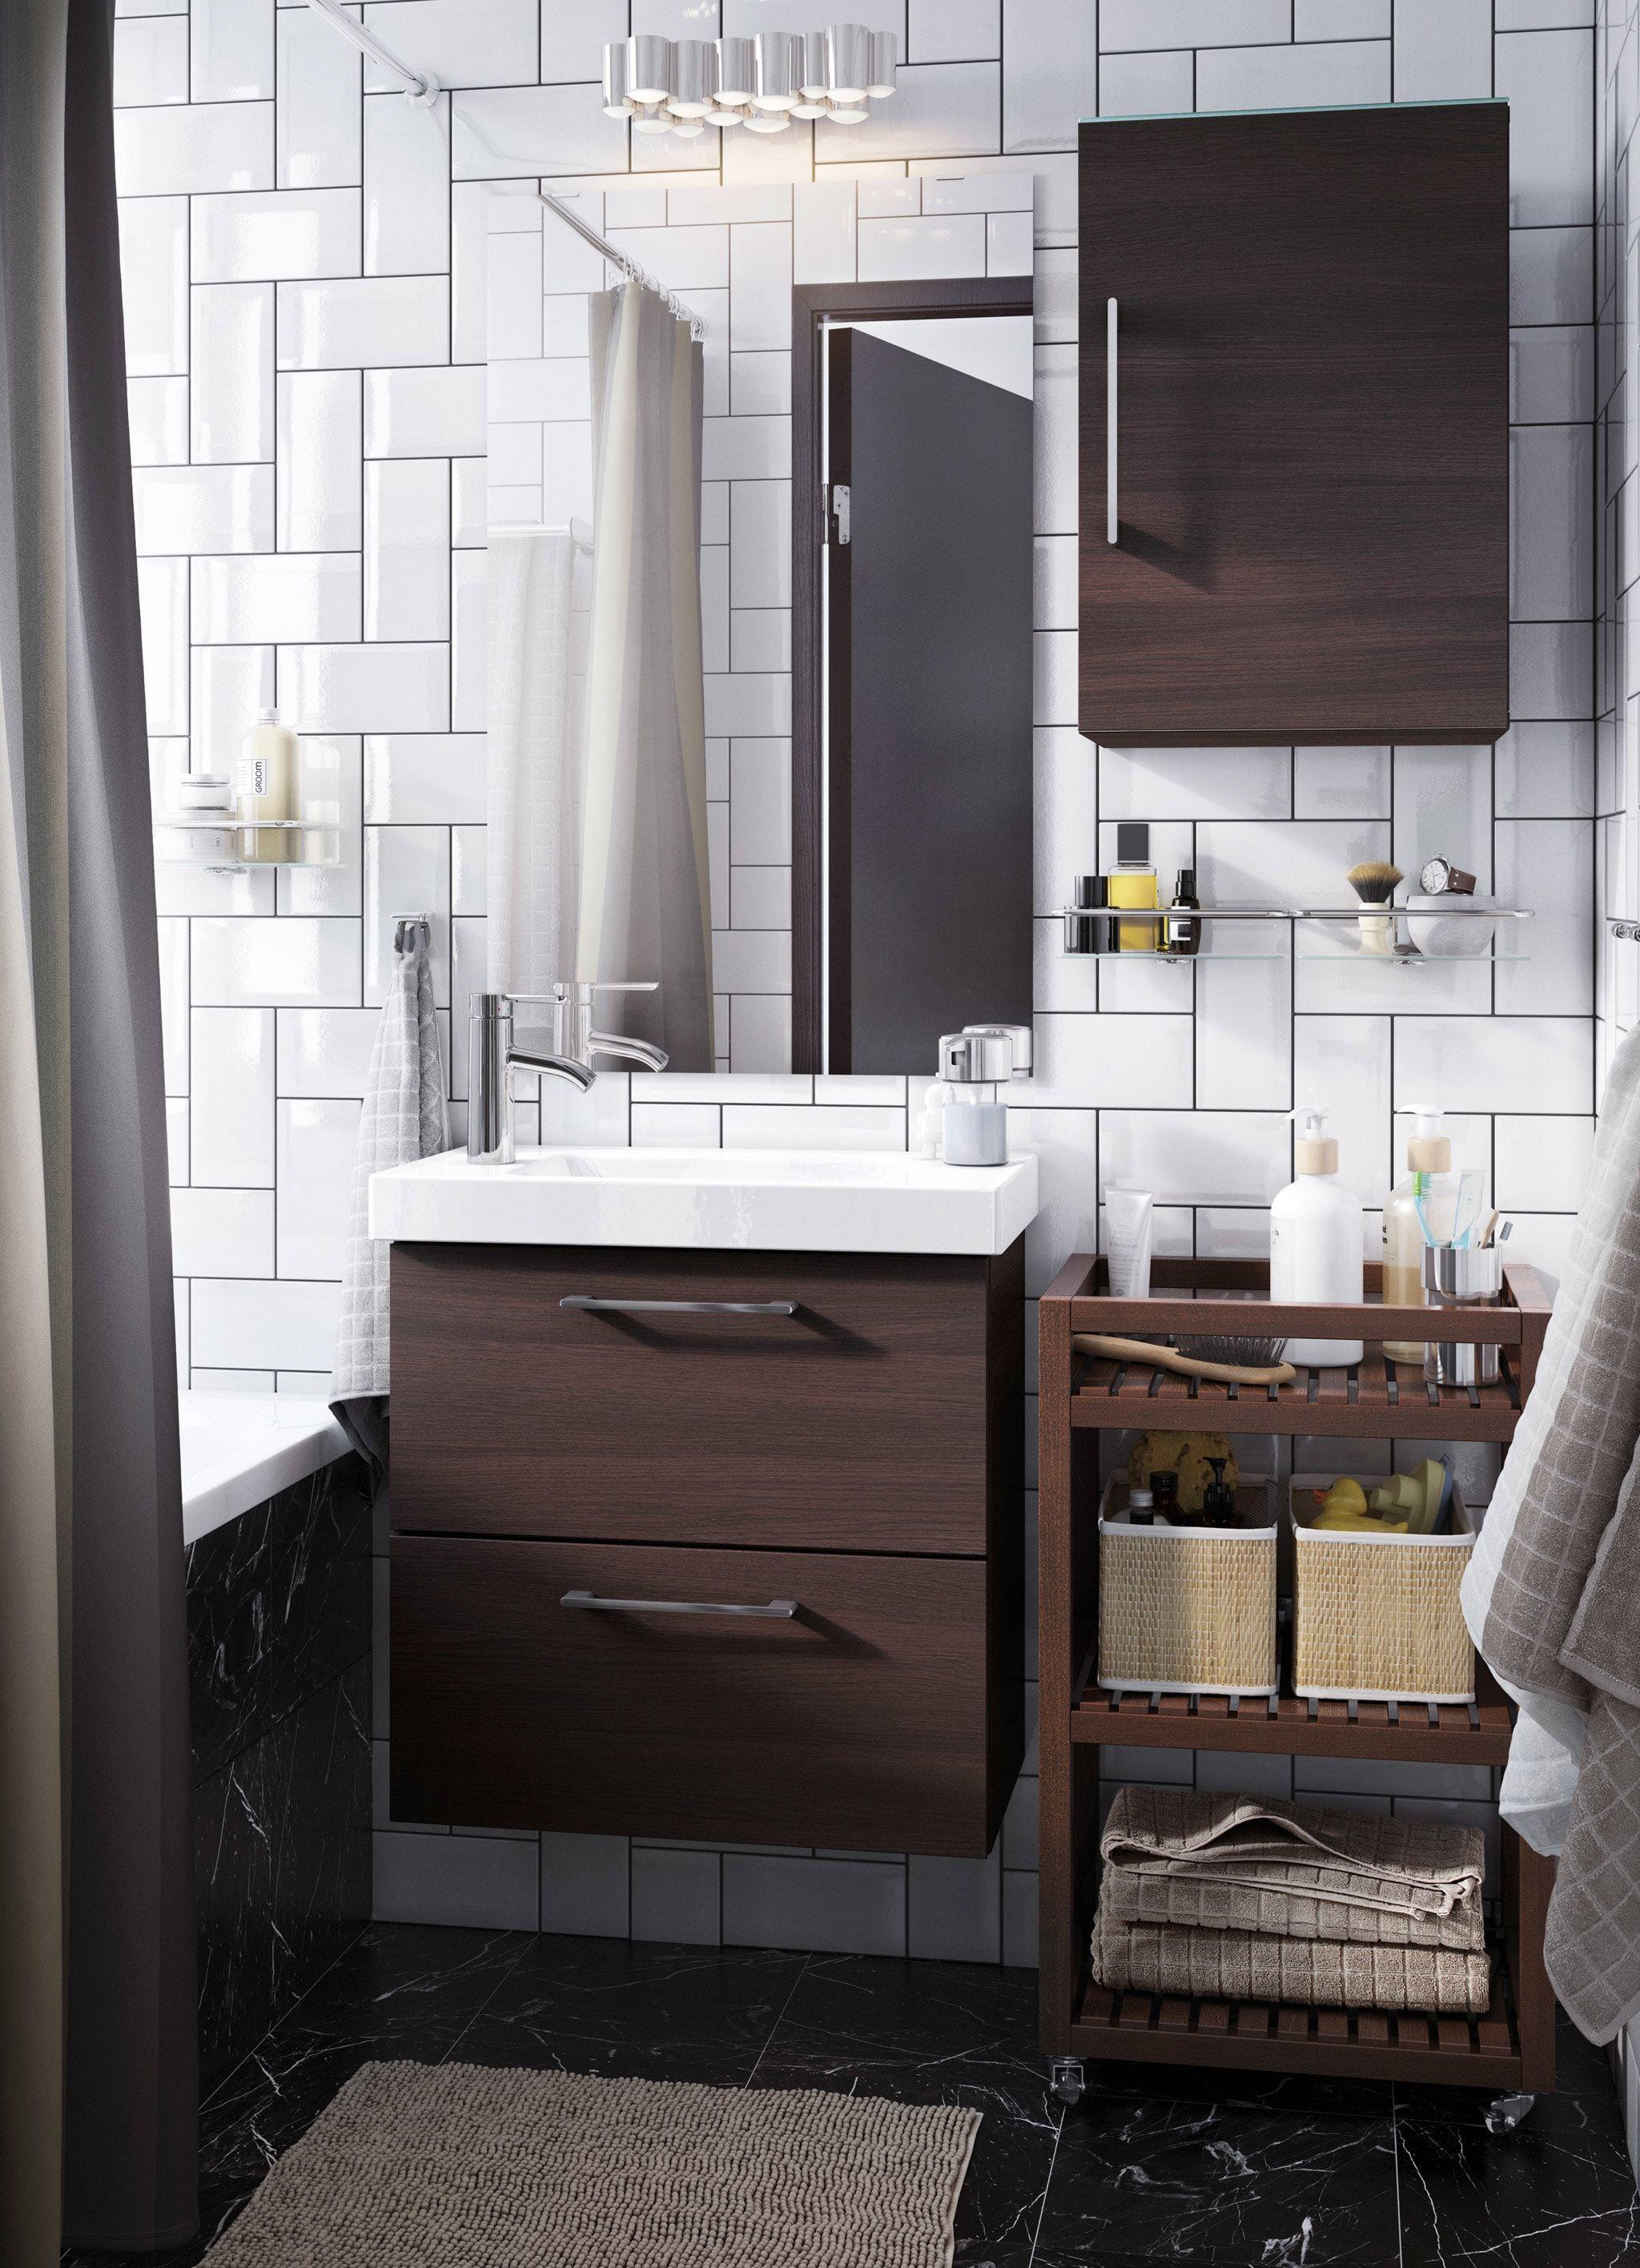 A Gallery Of Bathroom Inspiration Ikea Bathroom Small White Bathrooms Bathroom Cabinets Ikea